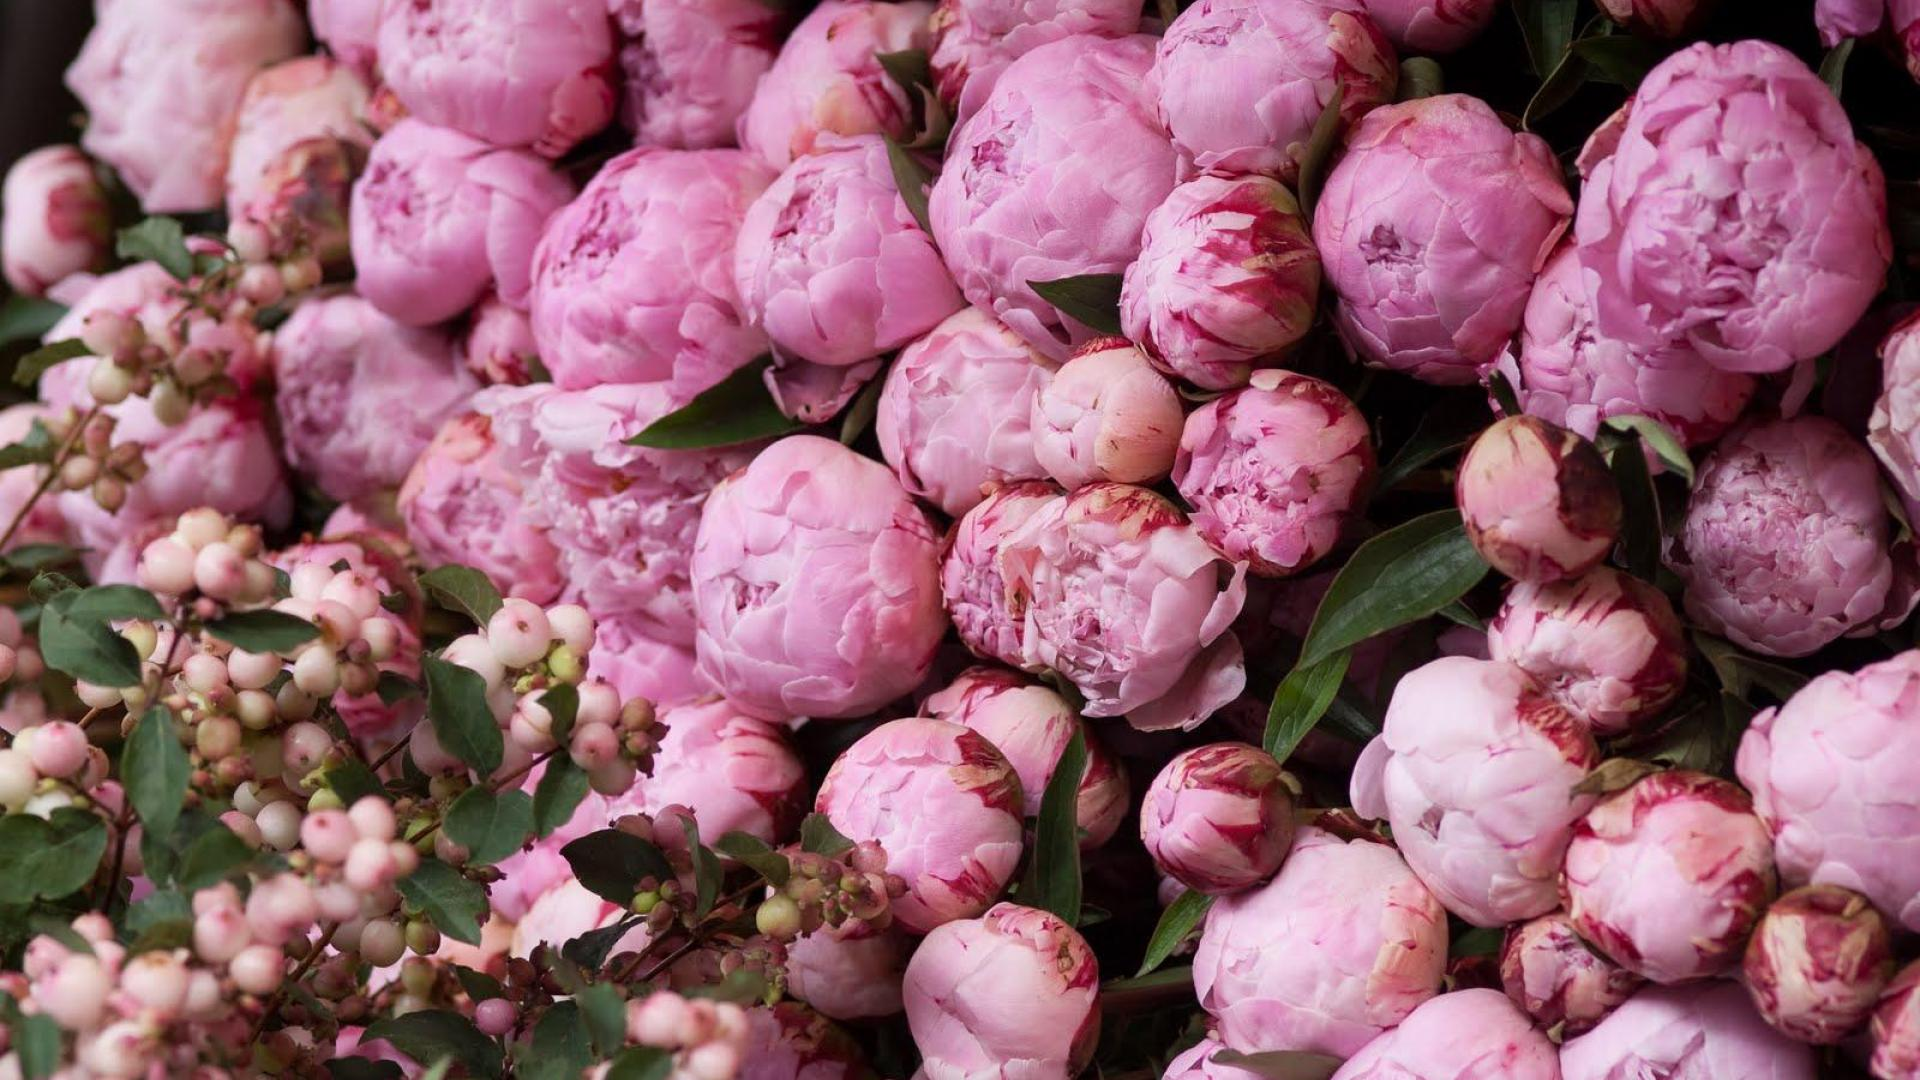 Pink Peonies: Pink Peony Wallpaper Hd Wallpapers 1920x1080px